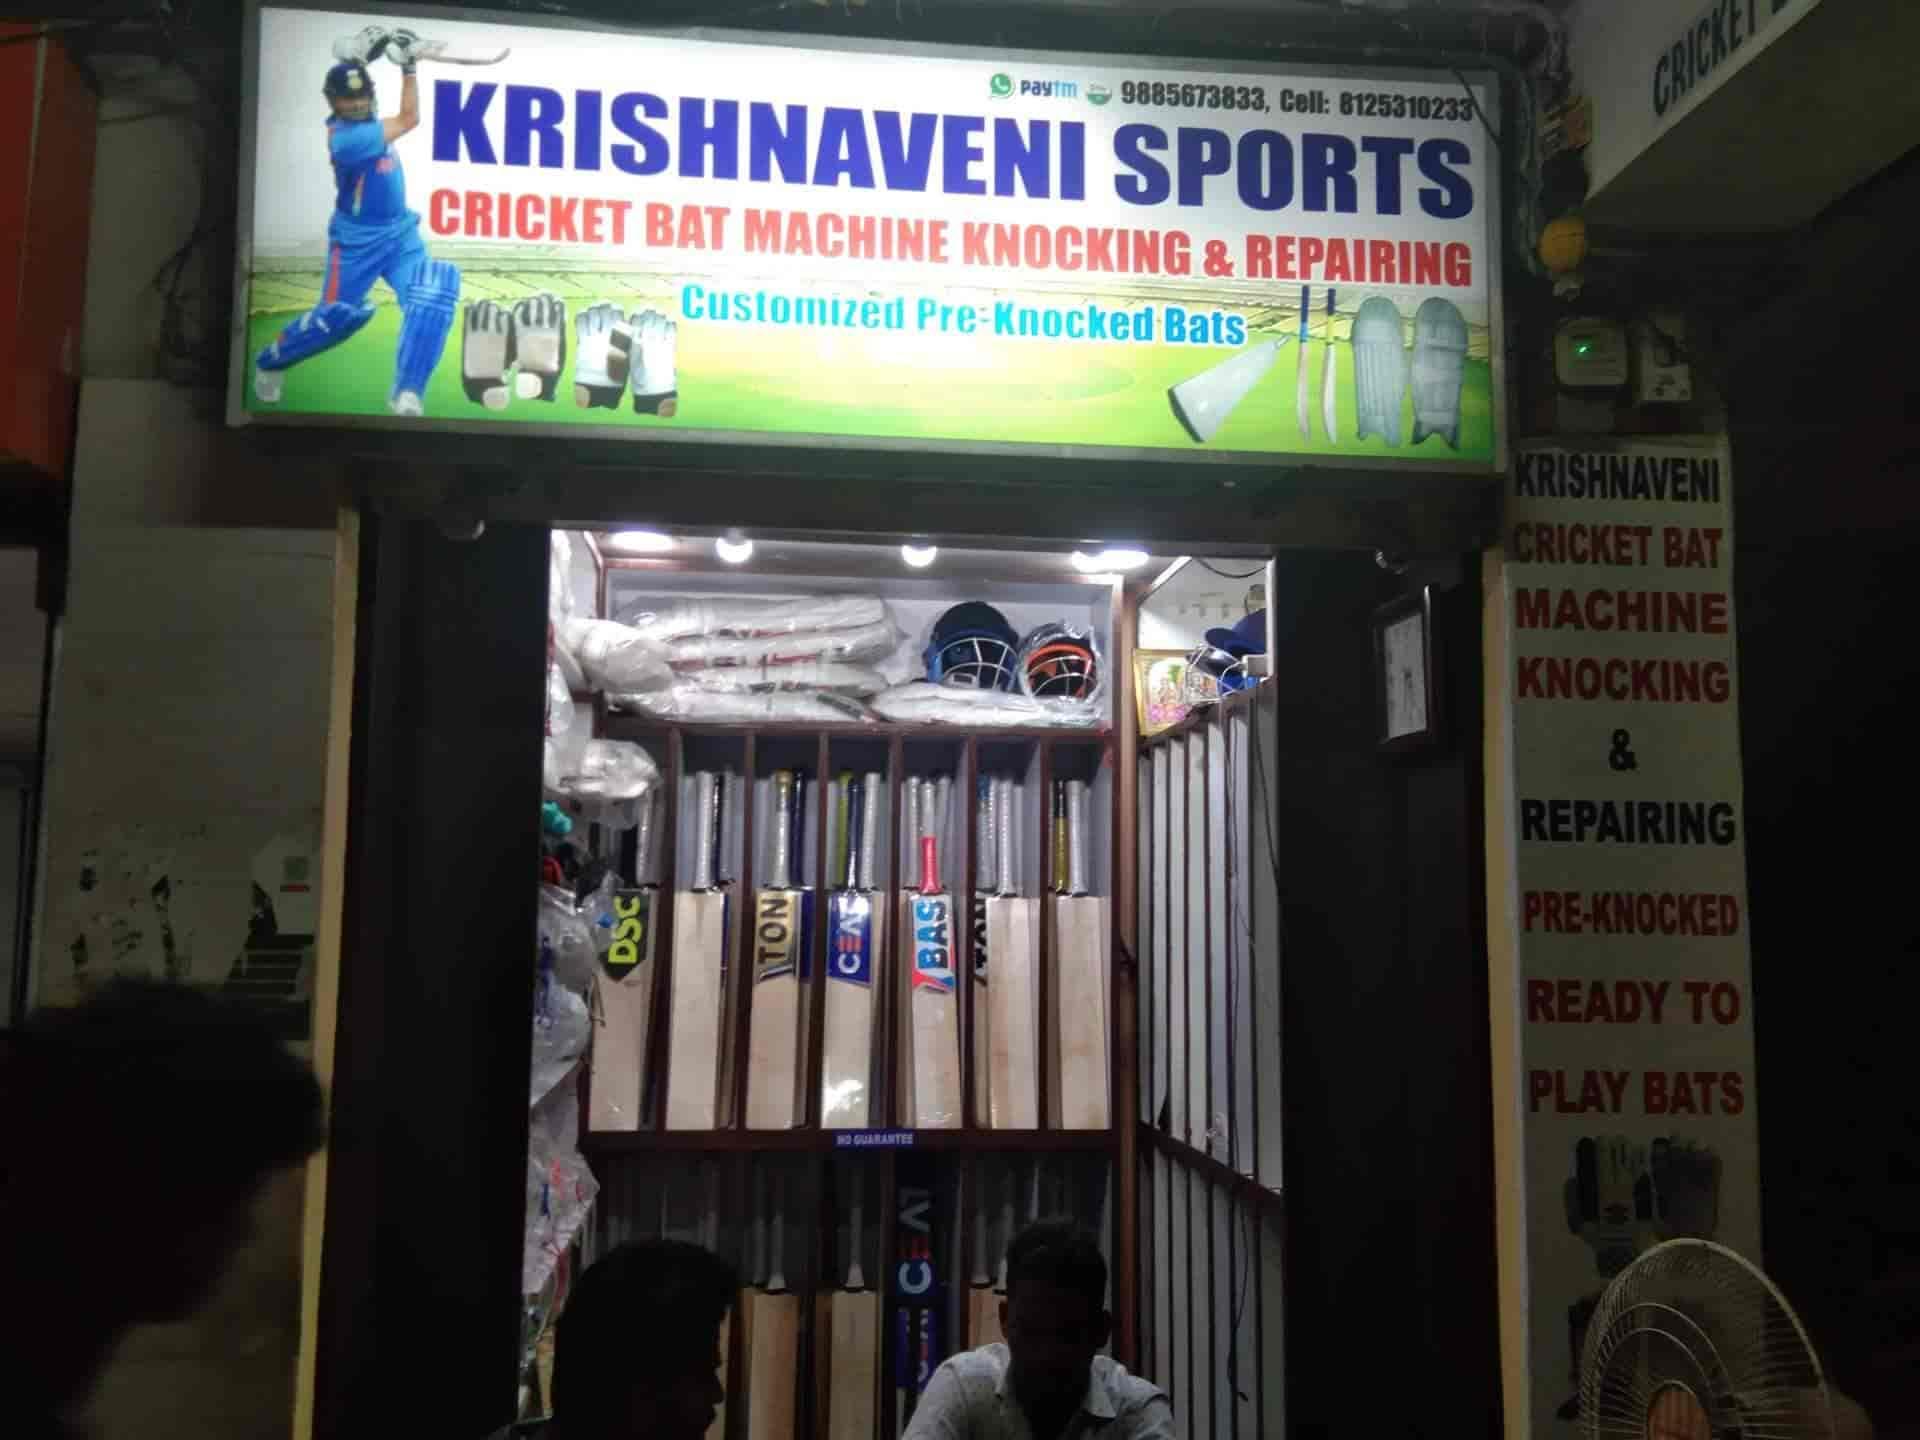 Krishnaveni Cricket Bats Machine Knocking And Repairing